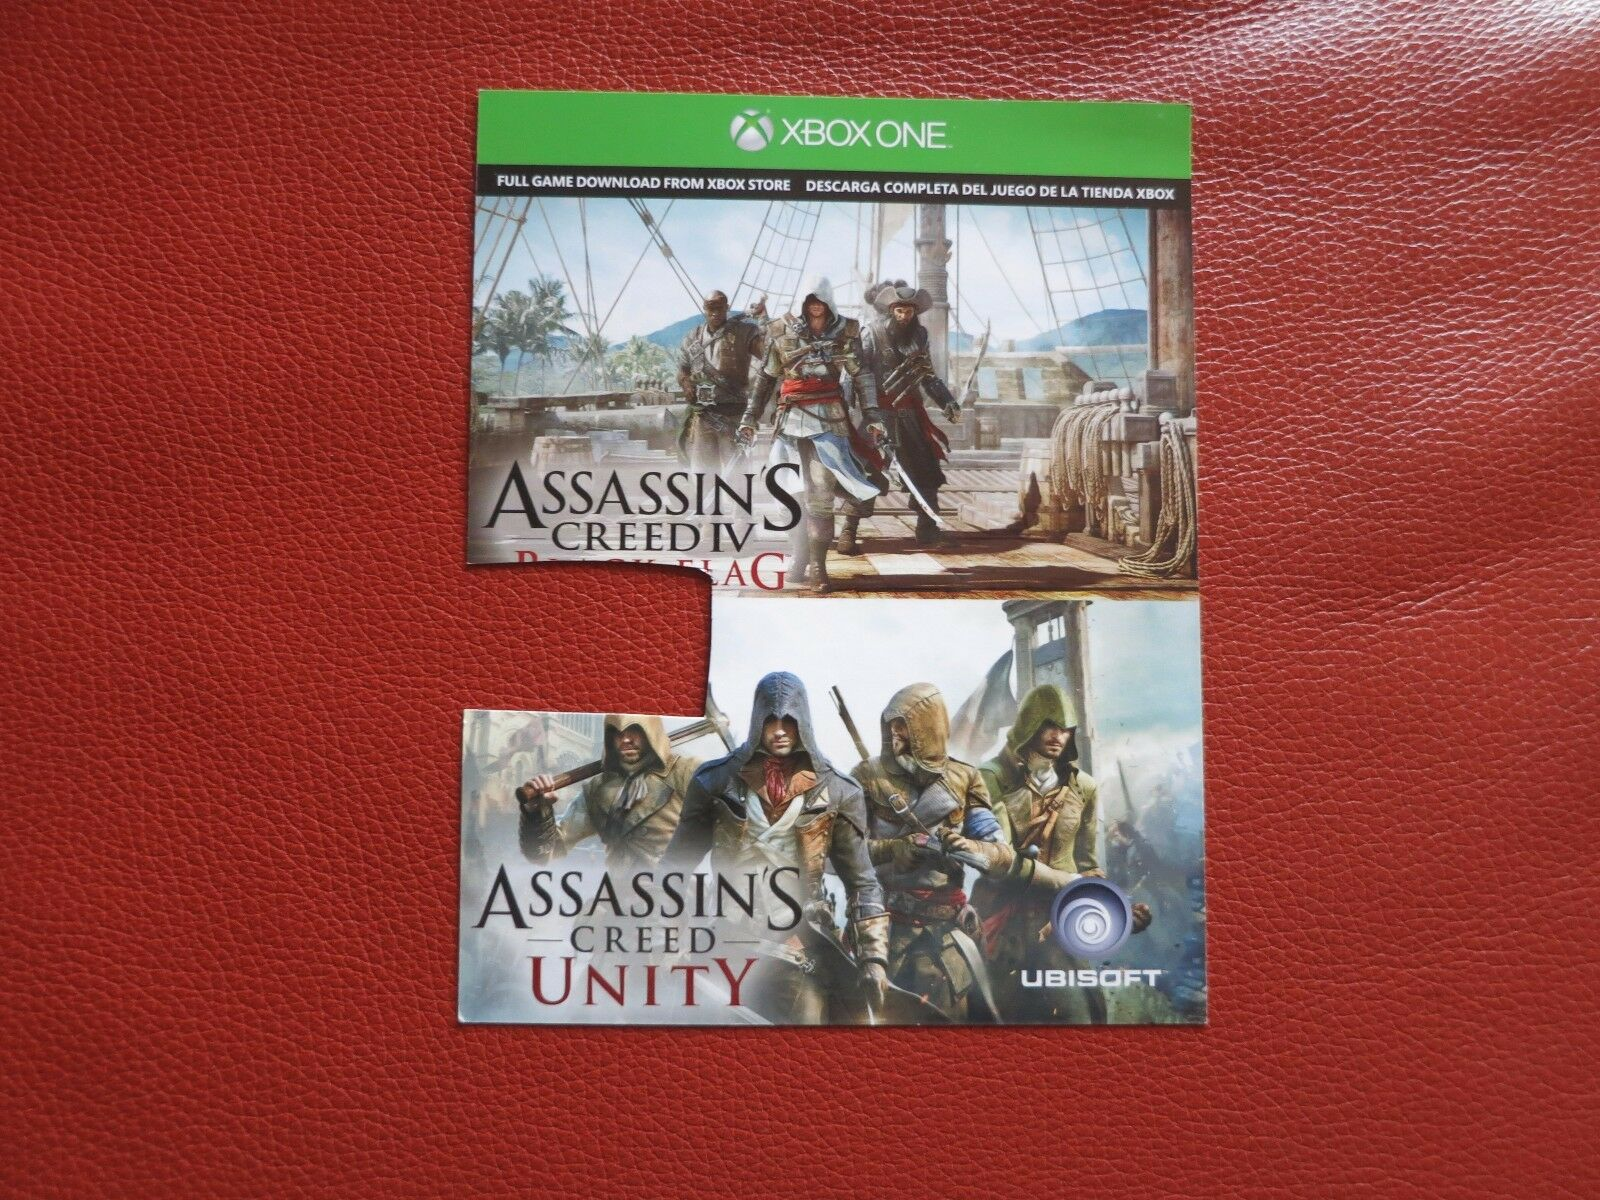 UPC 875873001184 - Assassin's Creed Iv Black Flag & Assassin's Creed